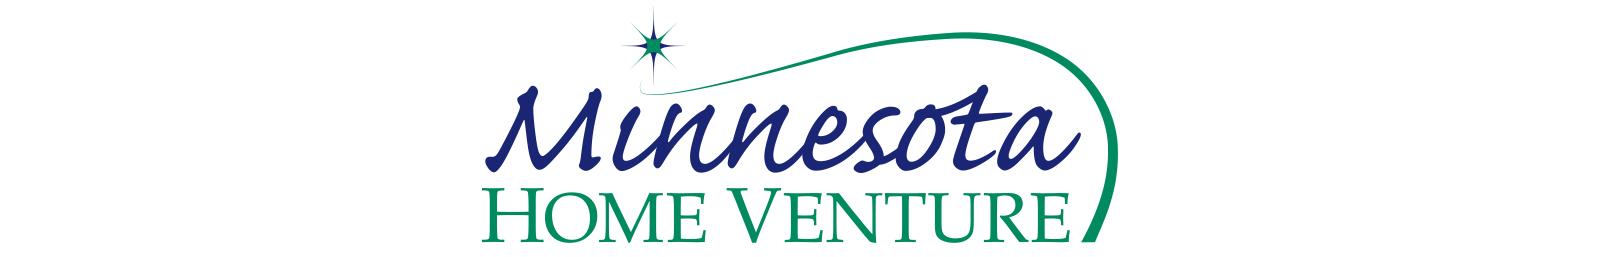 Minnesota Home Venture Logo